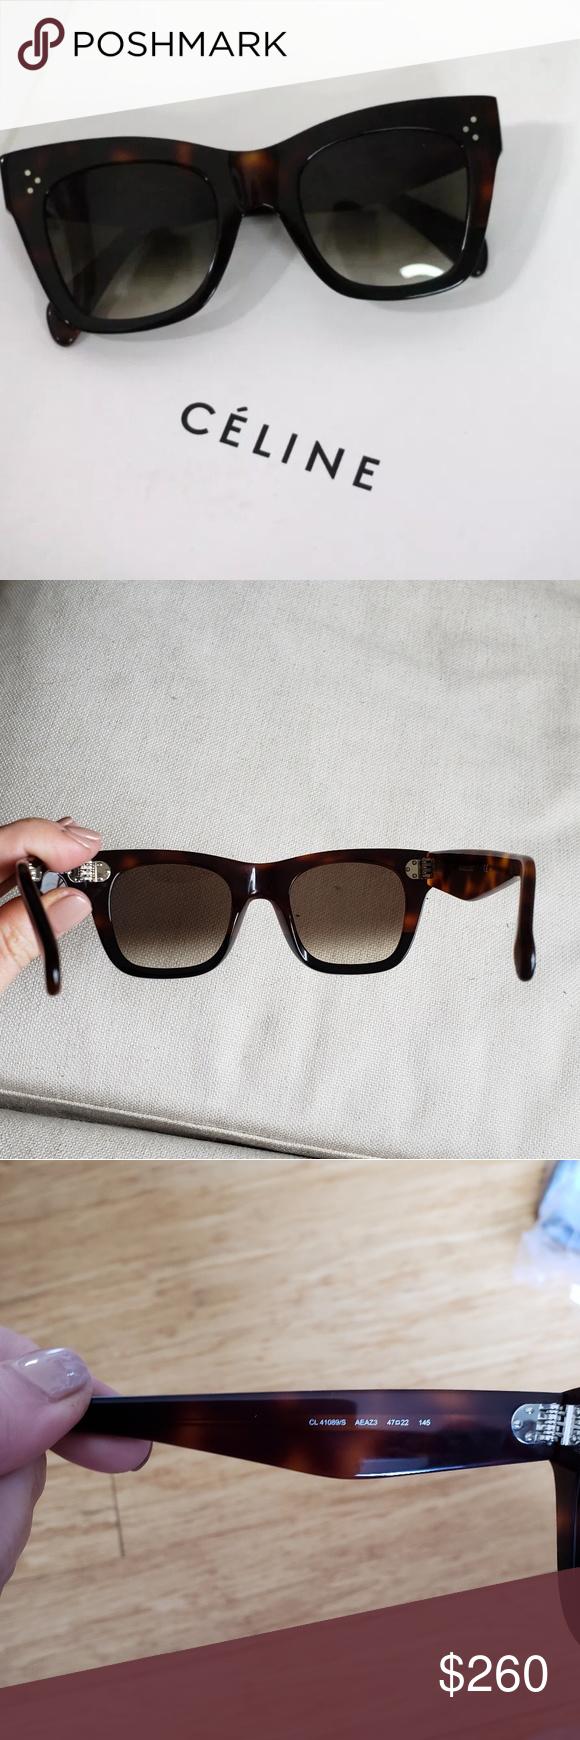 503b3d15dab9c Celine Catherine Sunglasses (41089 S)- NEW! Catherine Small Black Havana  Tortoise